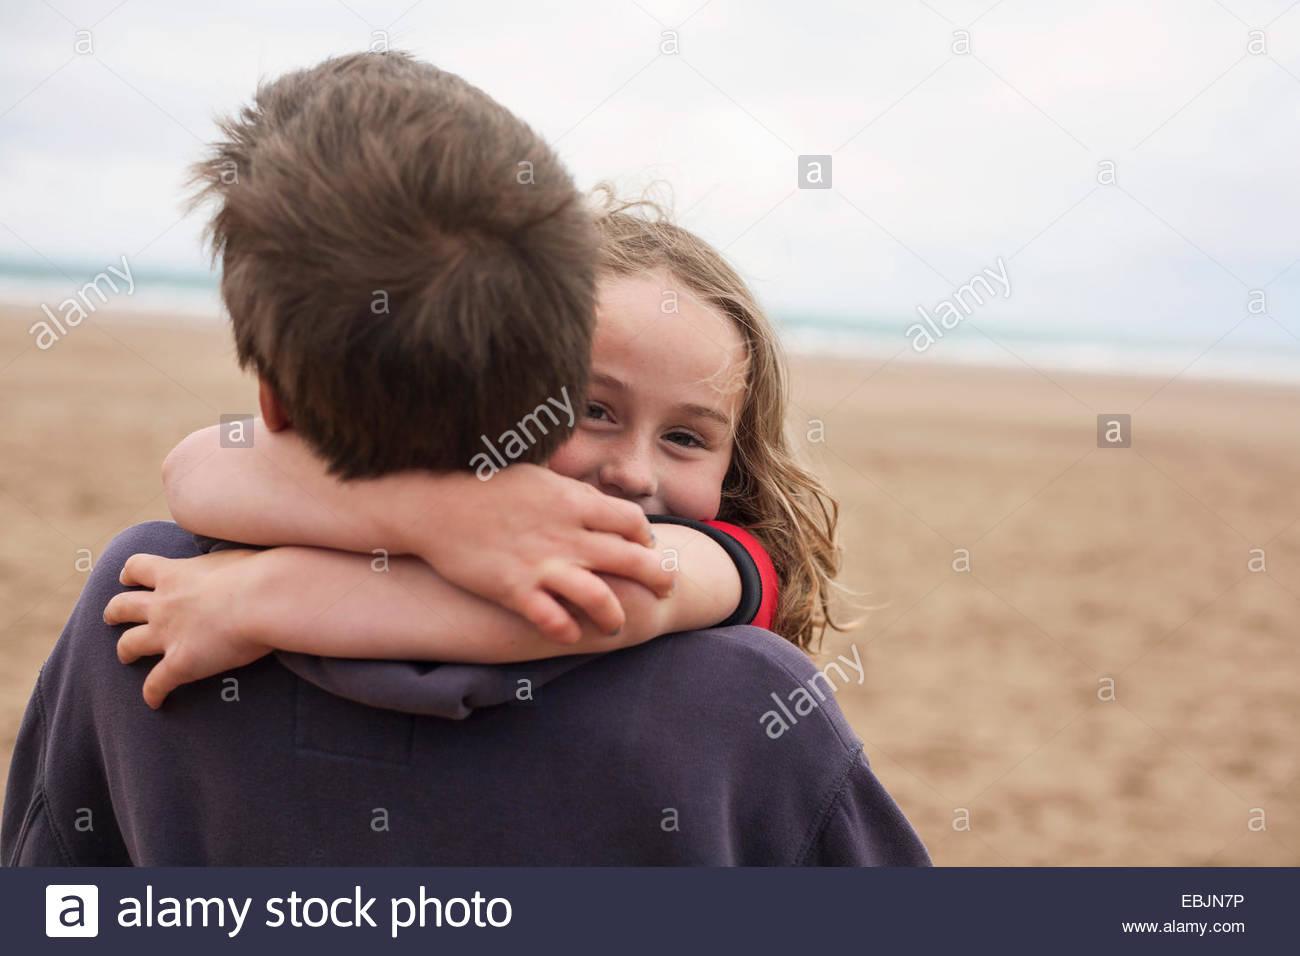 Girl hugging boy at beach - Stock Image